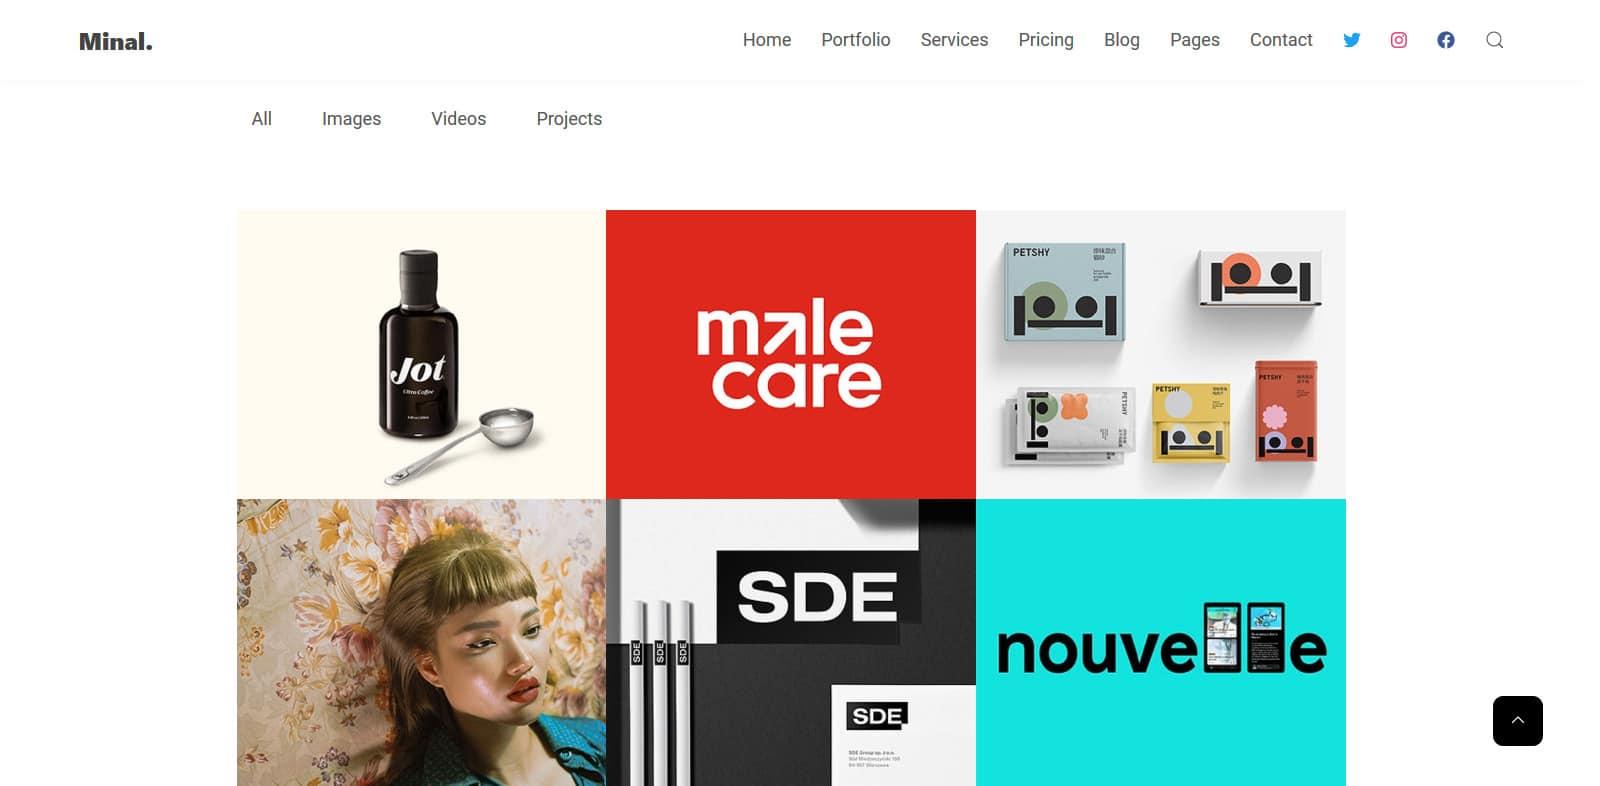 minal-simple-website-template